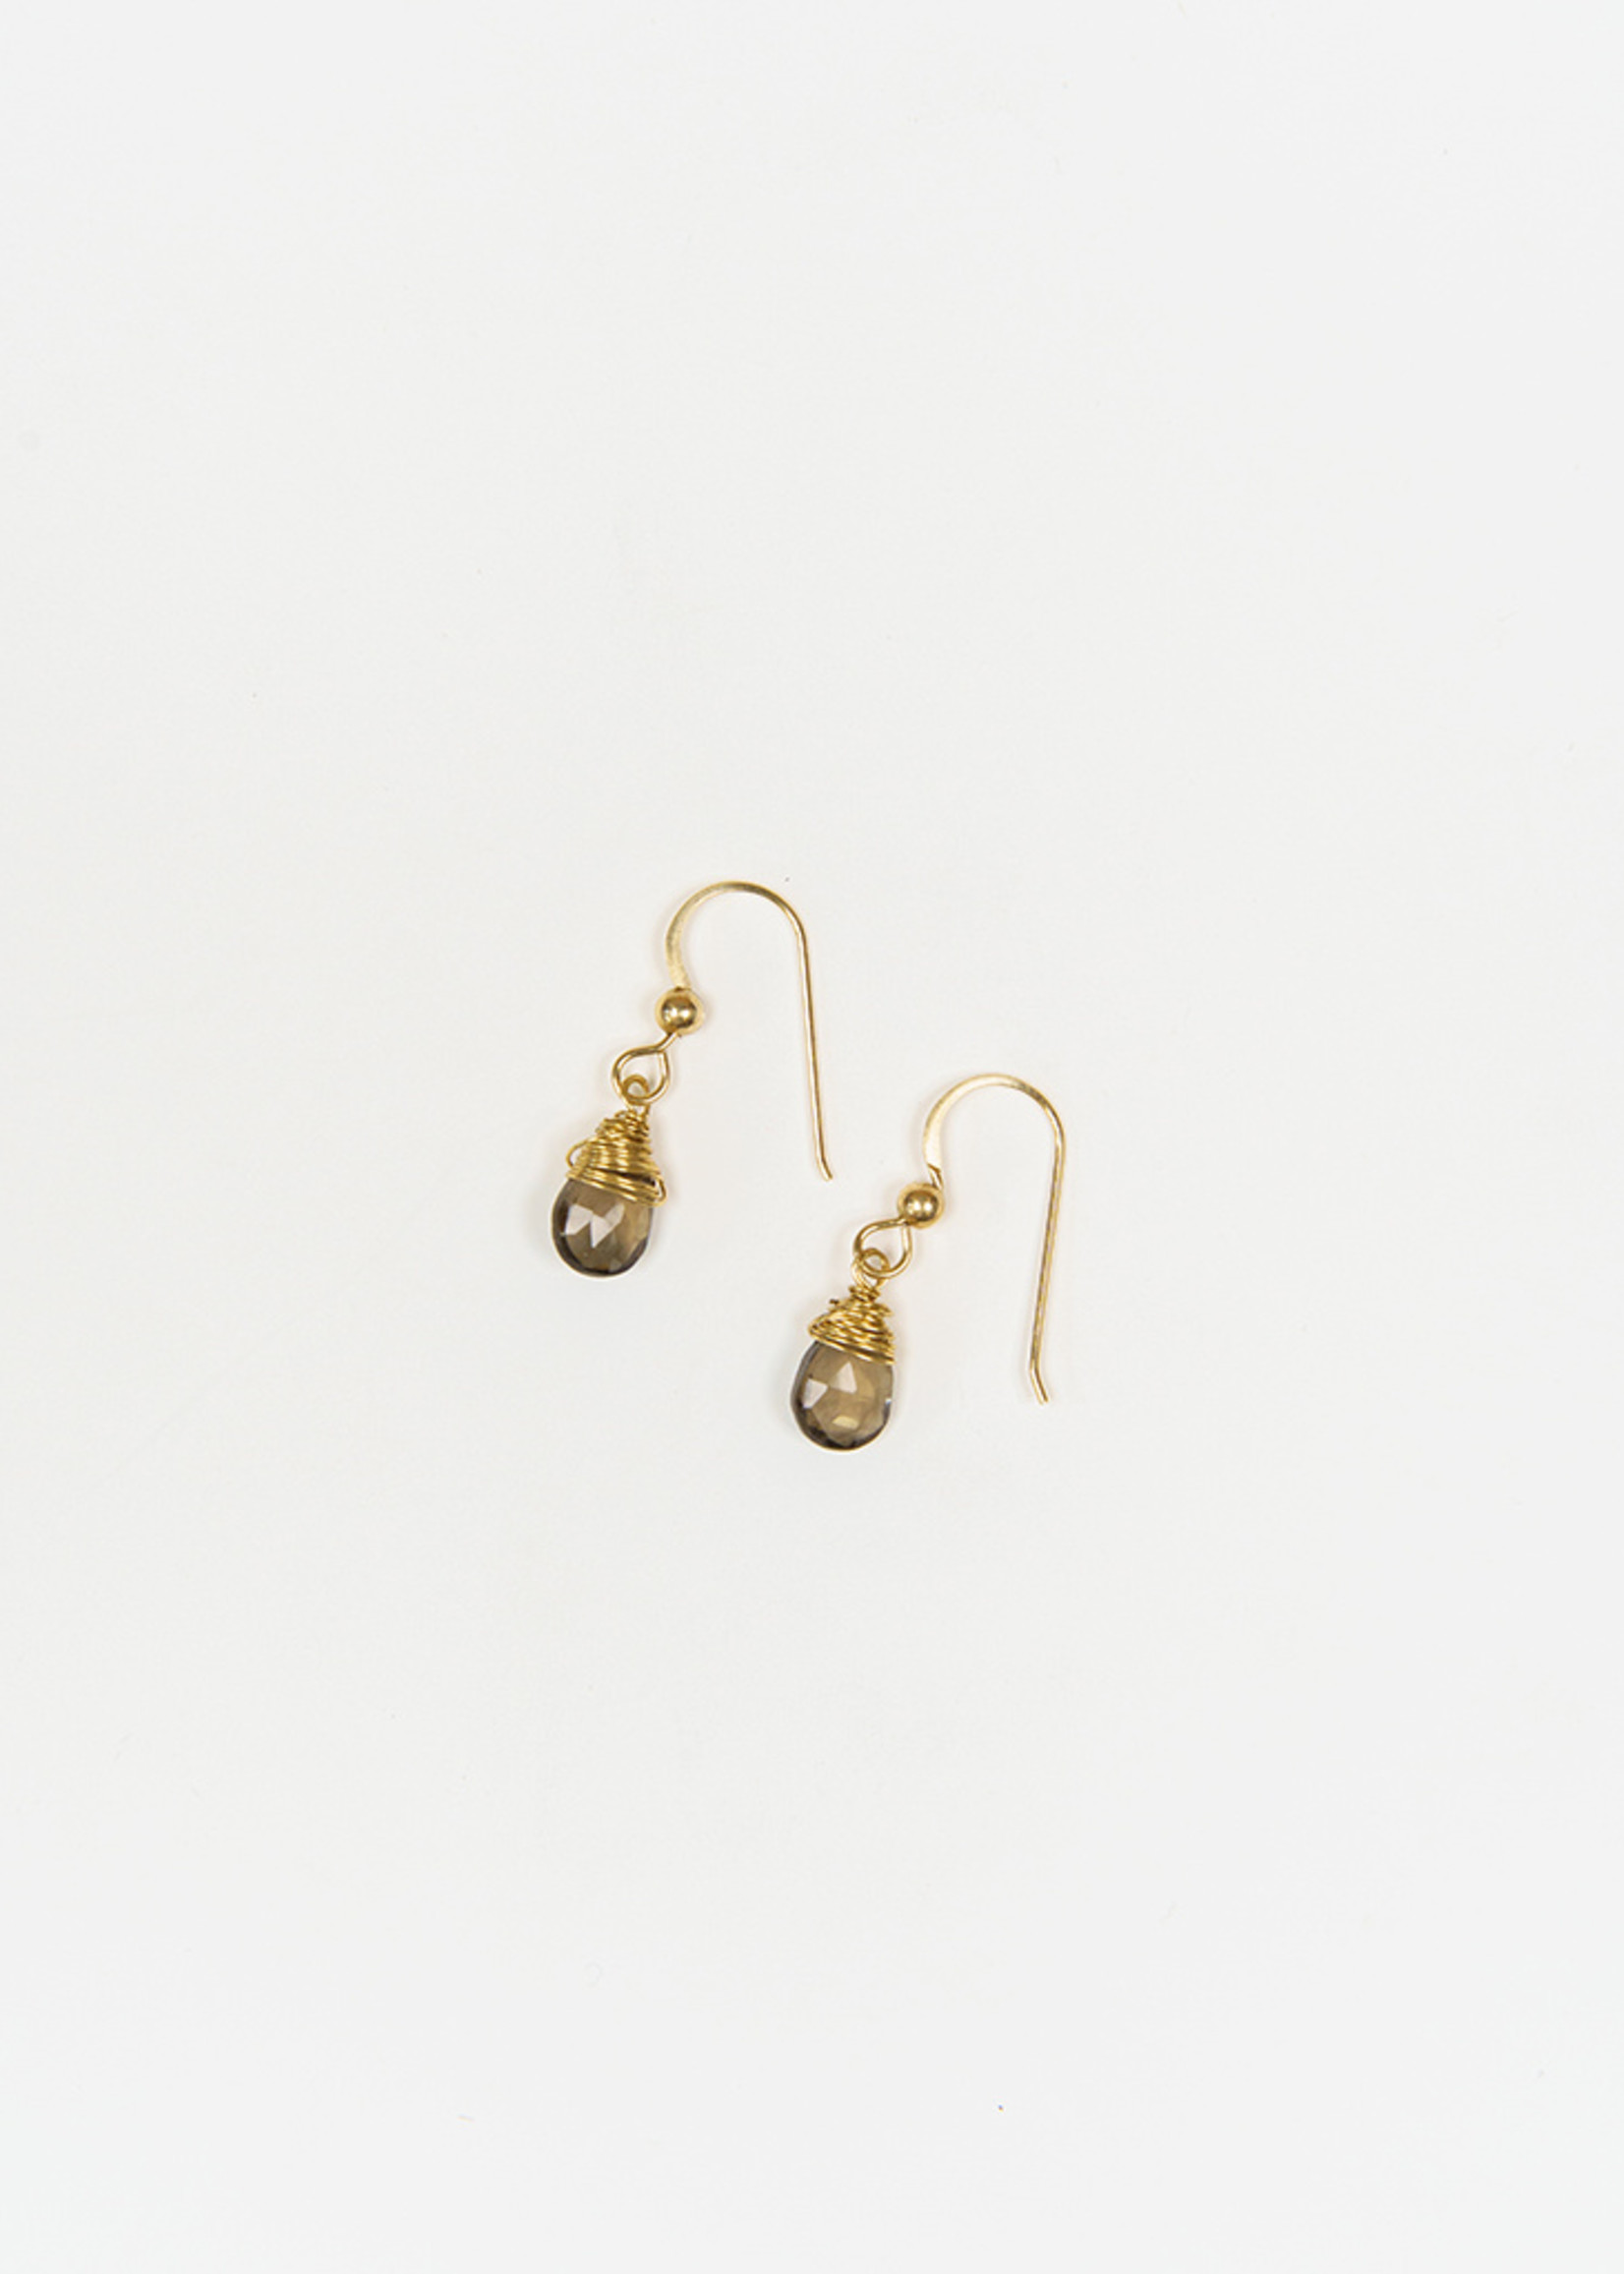 Forai Mingle Drop Smoky Quartz Earrings